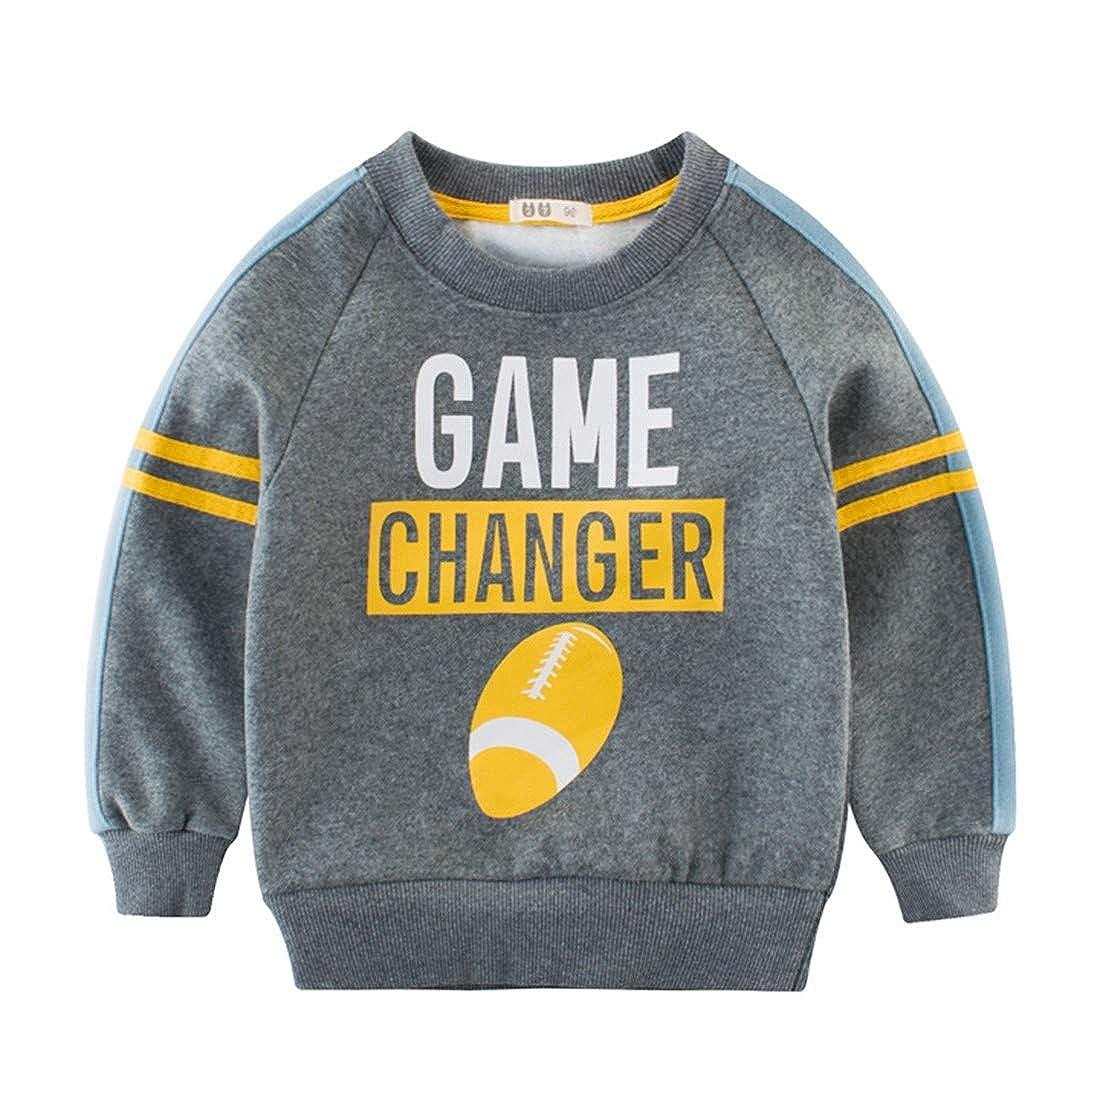 BesserBay Boys Shirts Toddler Long Sleeve Top Kids Football Tee Sweatshirt 2-10 Years